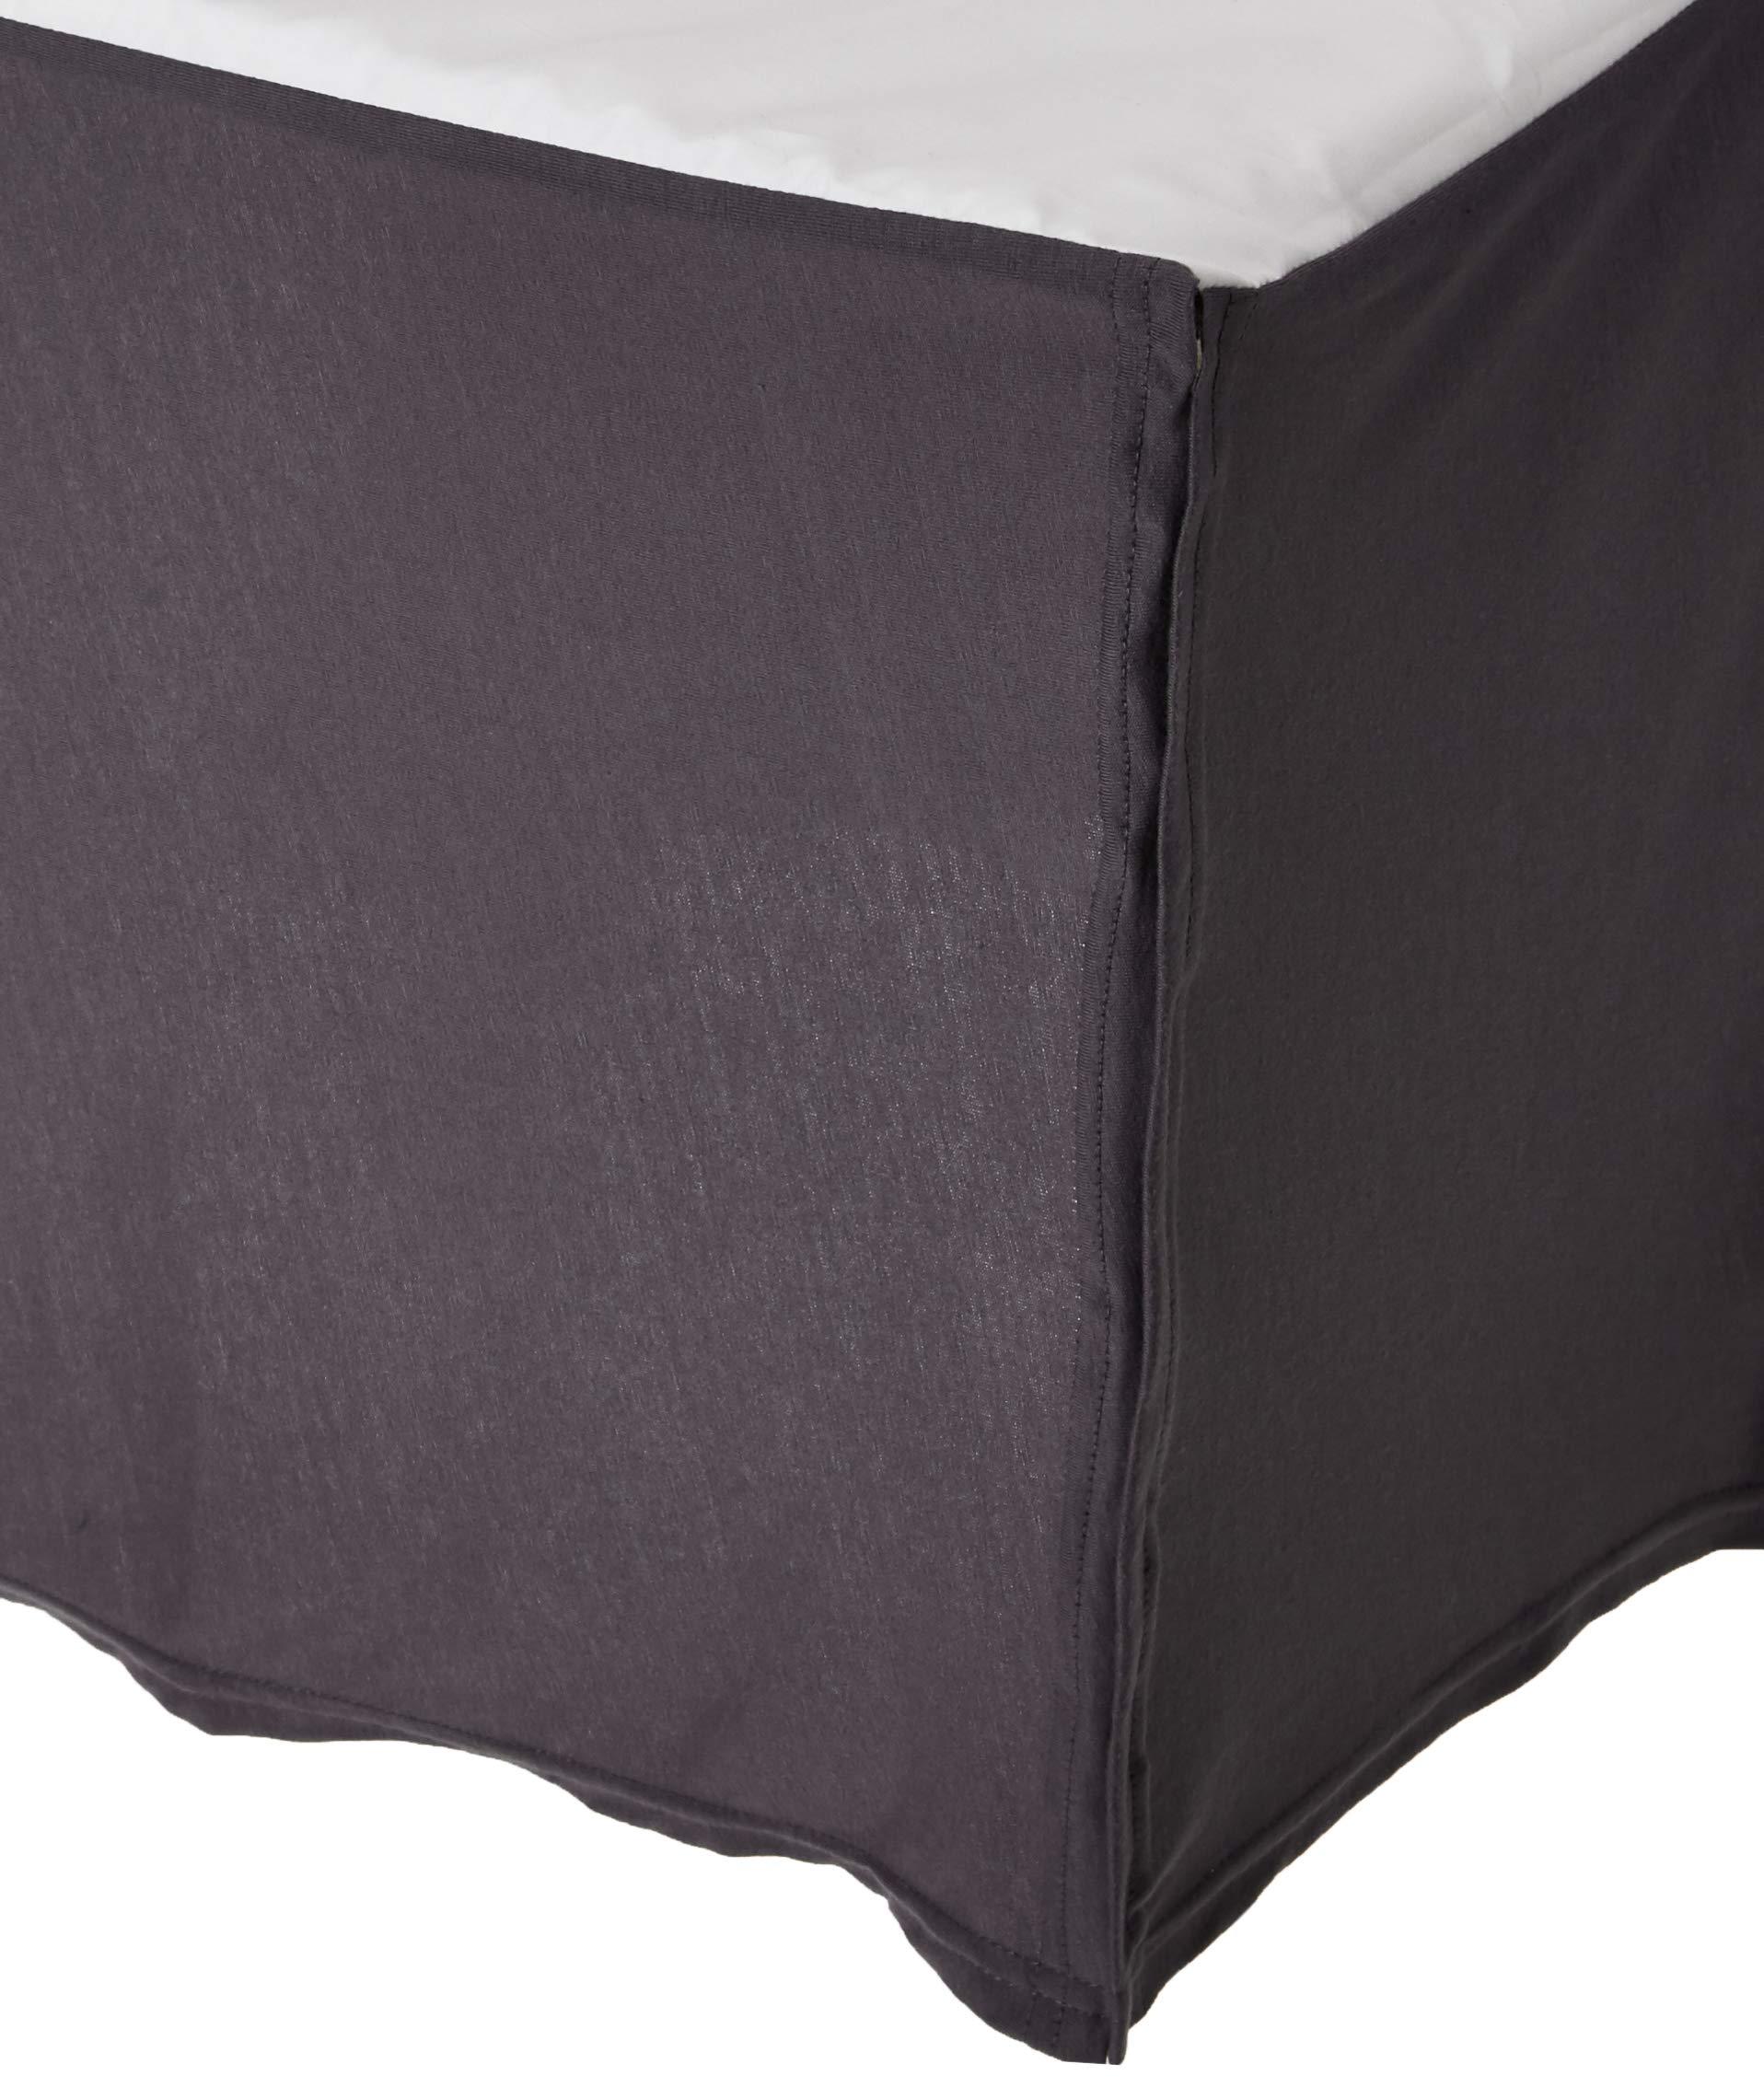 SheetWorld - MINI Crib Skirt (24 x 39) - Silver Grey Jersey Knit - Made In USA by SHEETWORLD.COM